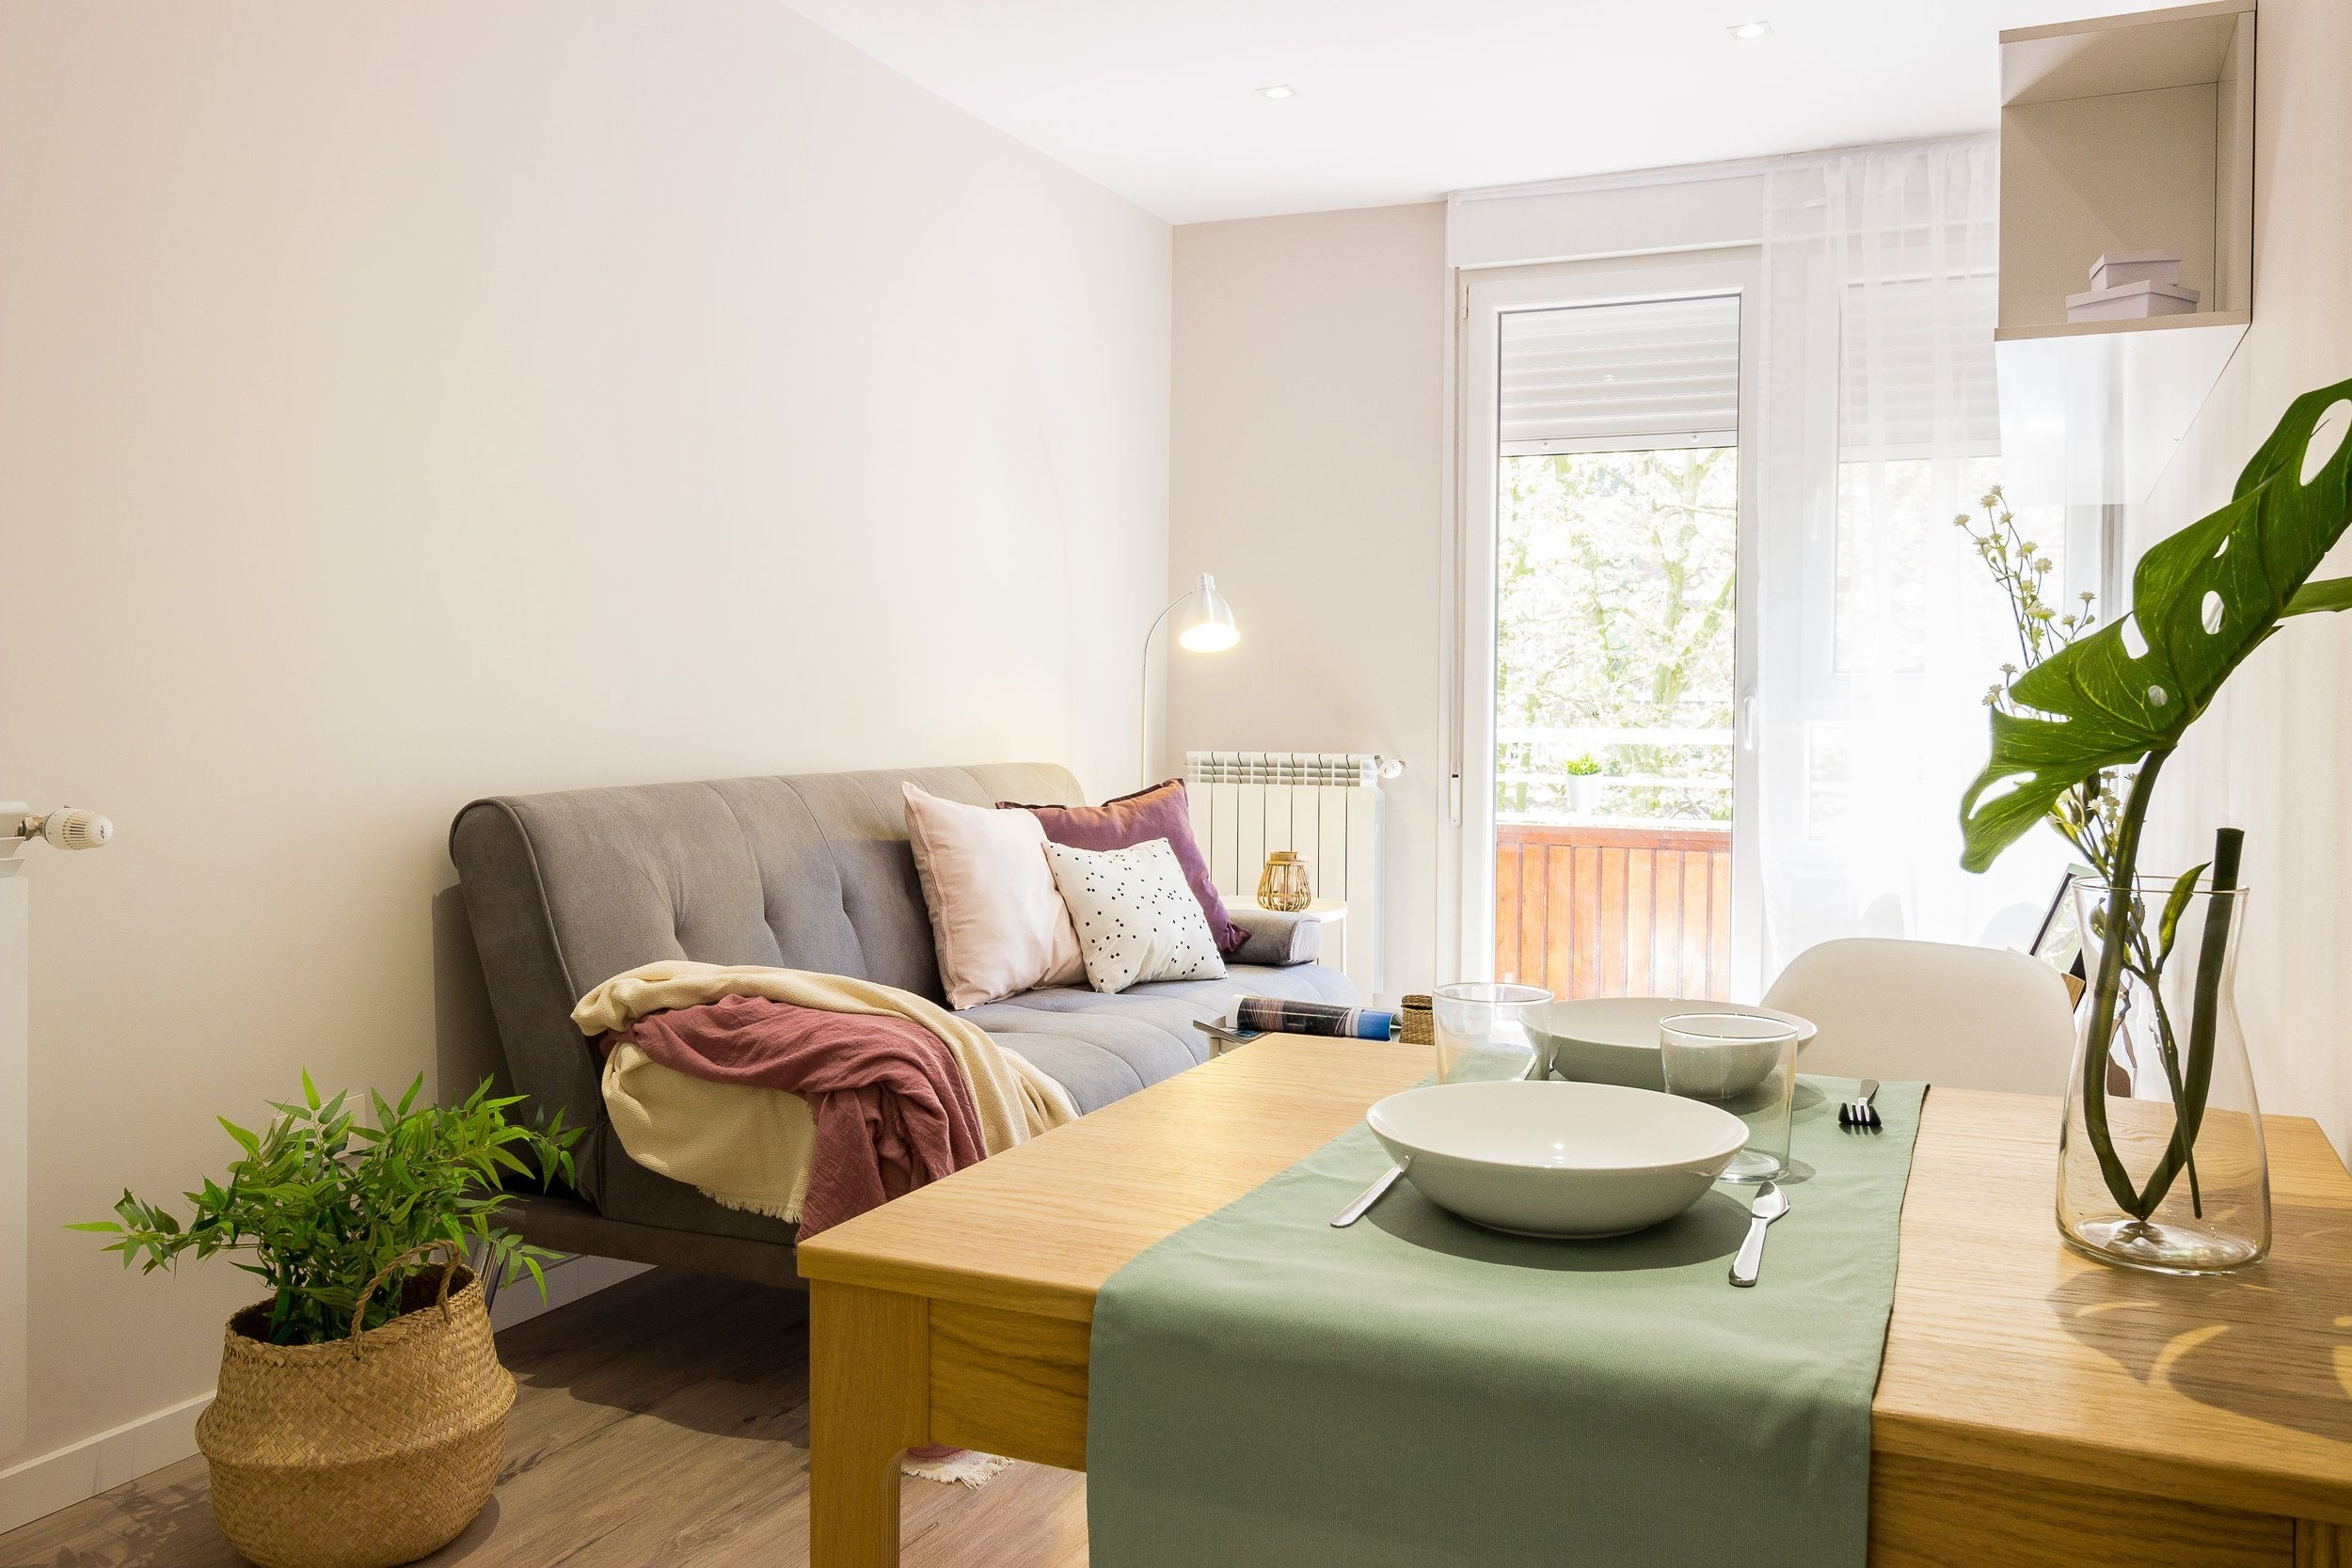 Astonishing Rental Apartment Decorating Ideas 50